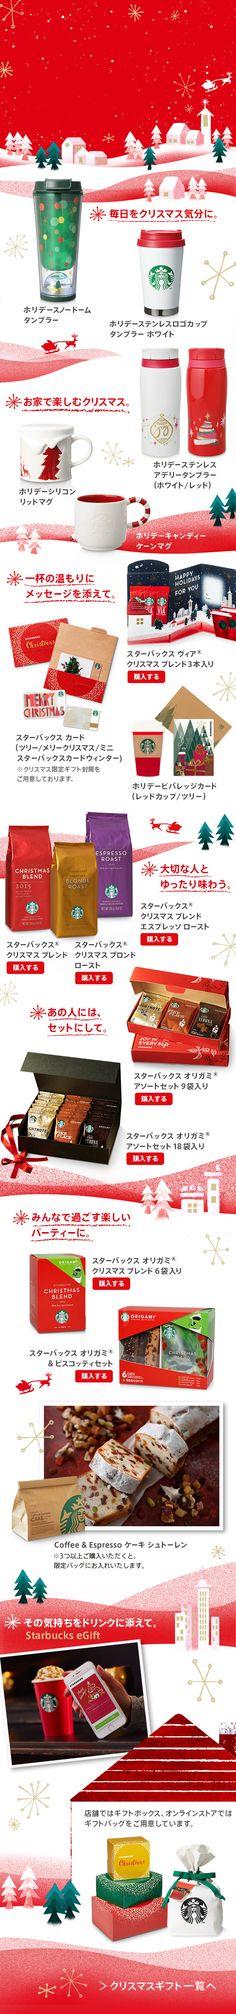 Graph Design, Pop Design, Layout Design, Starbucks Drinks, Starbucks Coffee, Intranet Design, Web Japan, Coffee Advertising, Christmas Poster